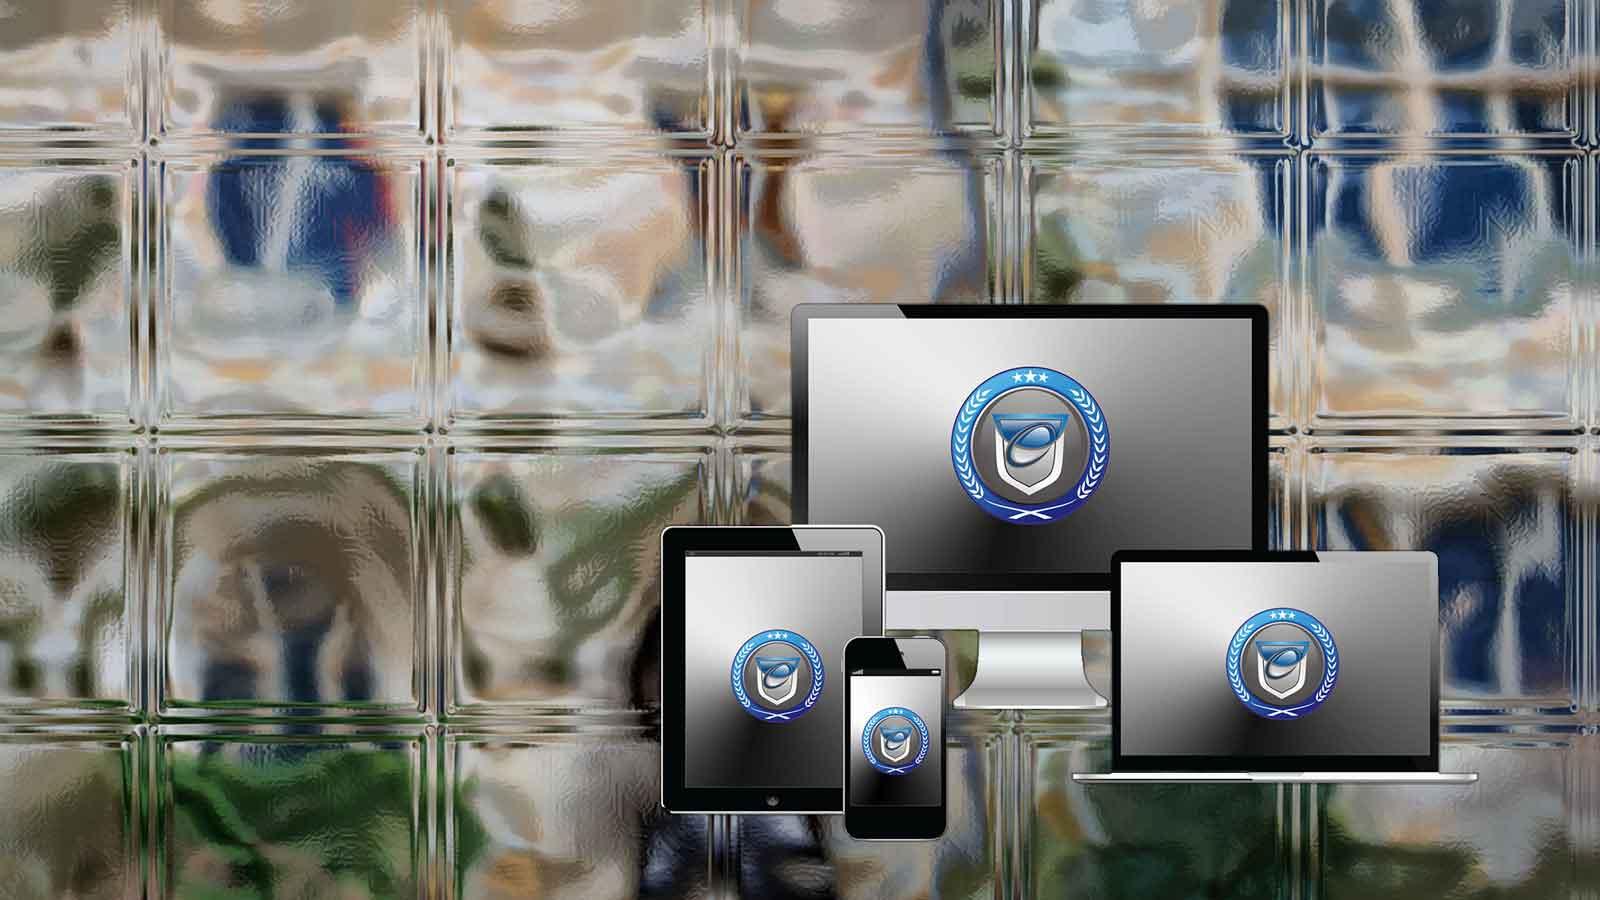 College Admission Technology Devices - Desktop Laptop Tablet Smartphone